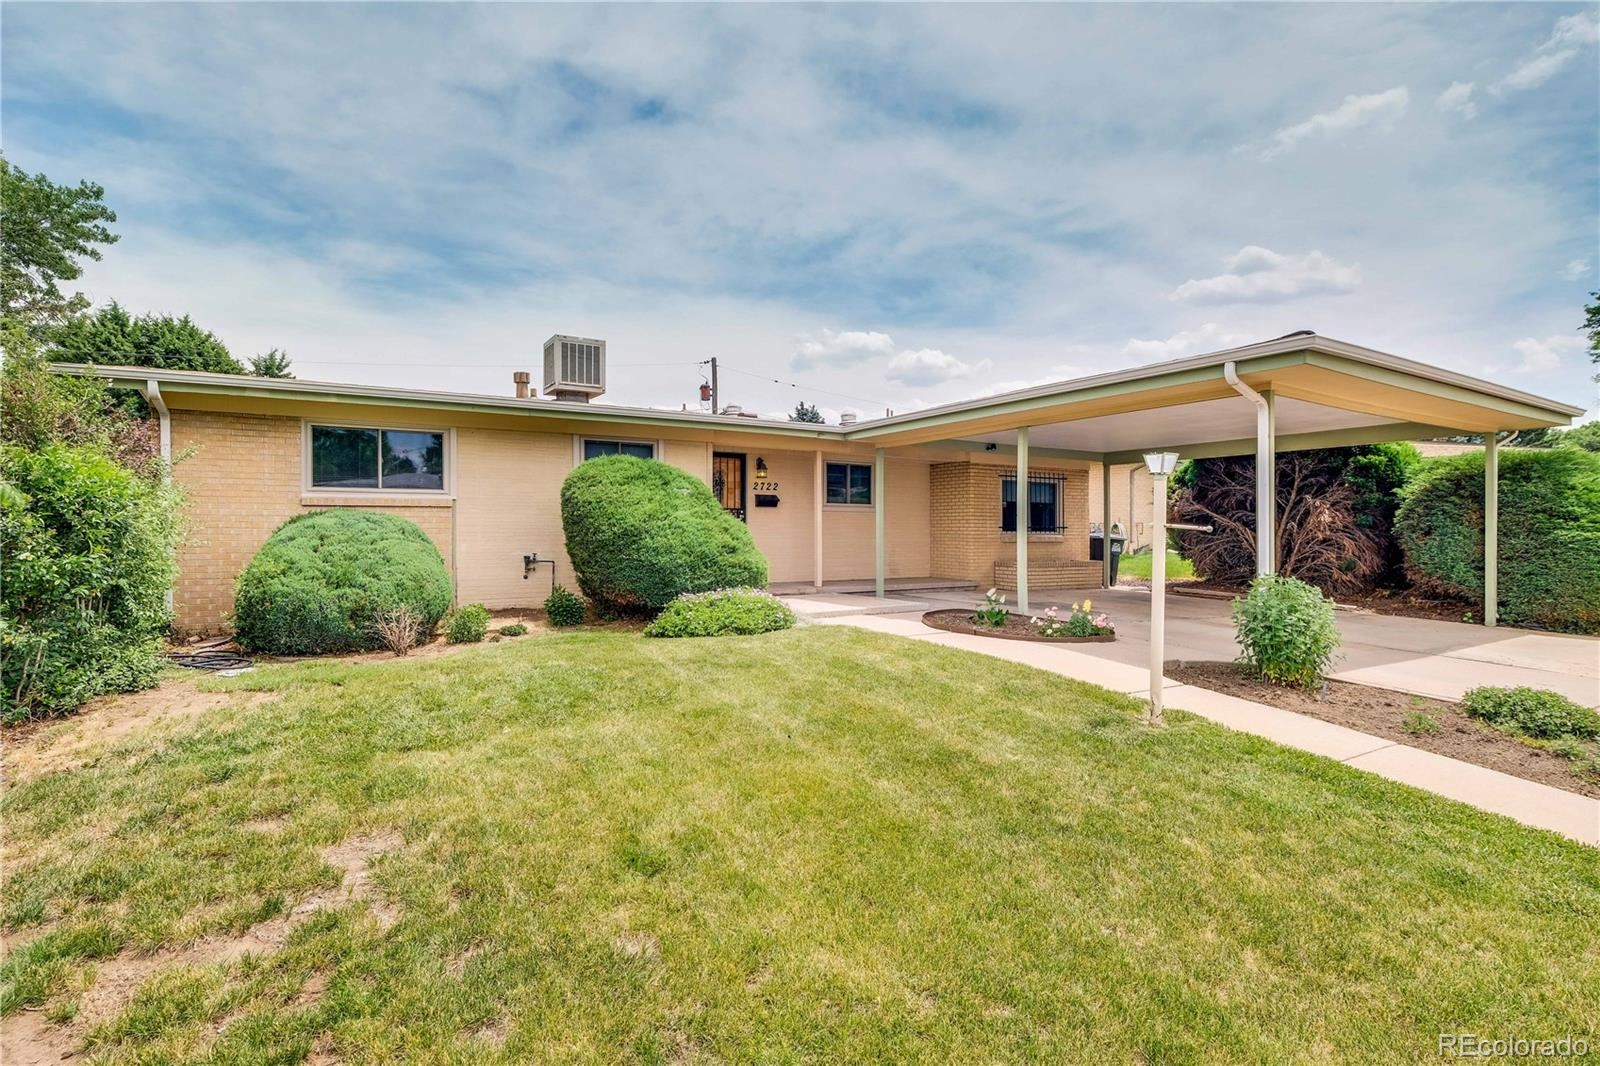 2722 S Meade Street, Denver, CO 80236 - #: 7607603